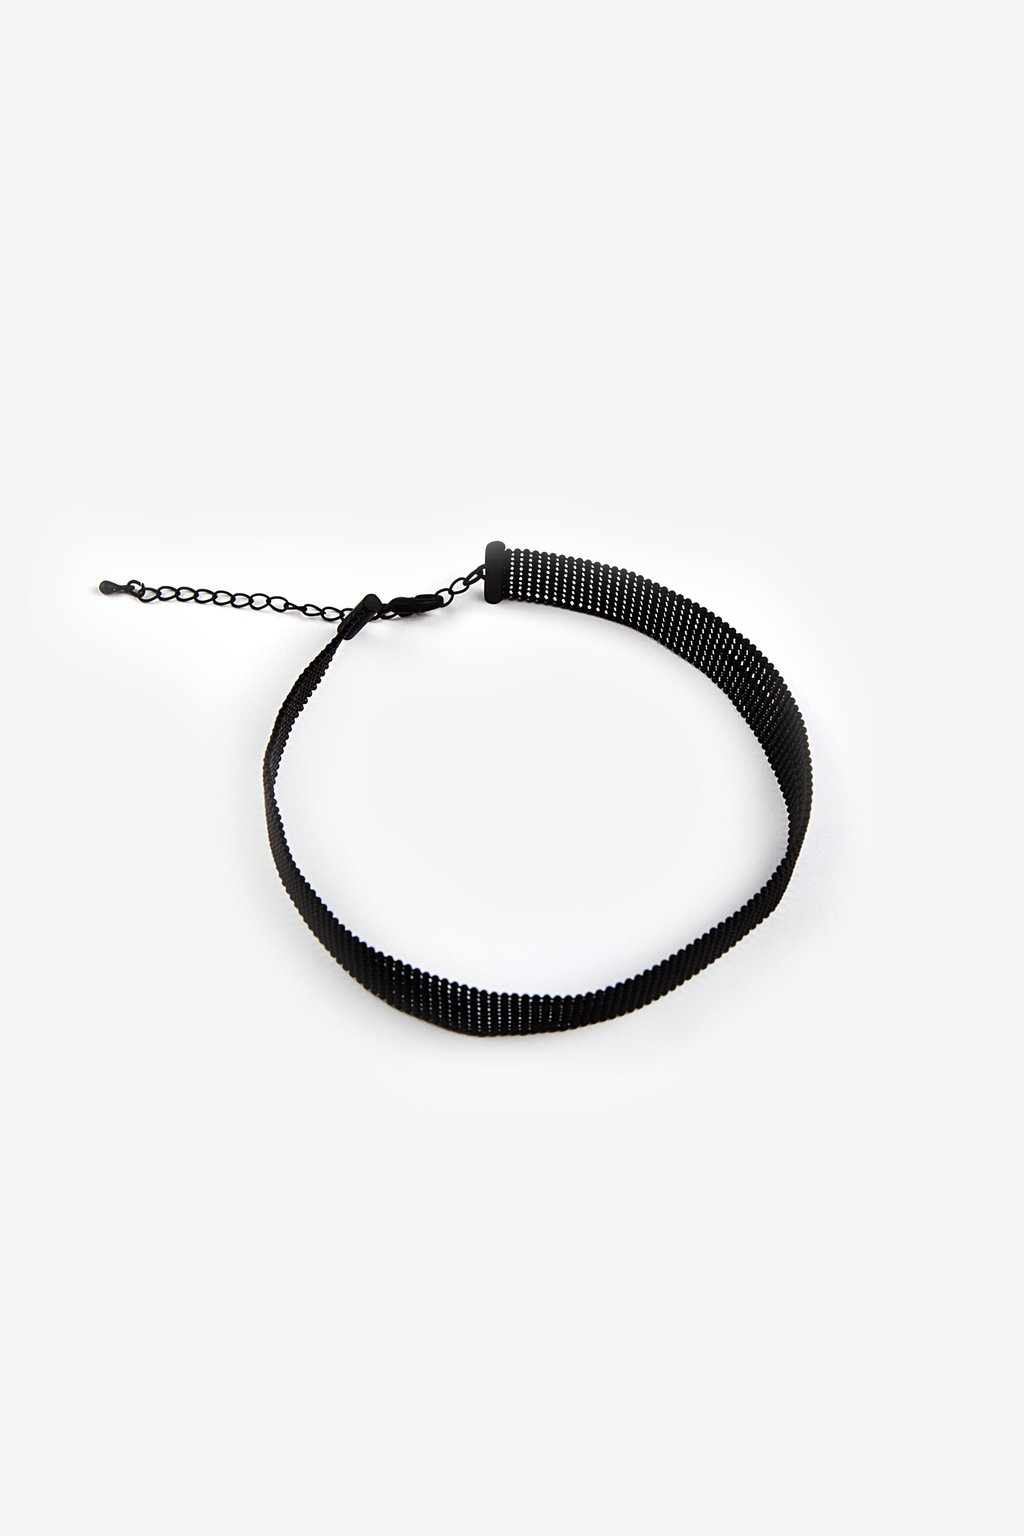 Necklace H010 Black 1